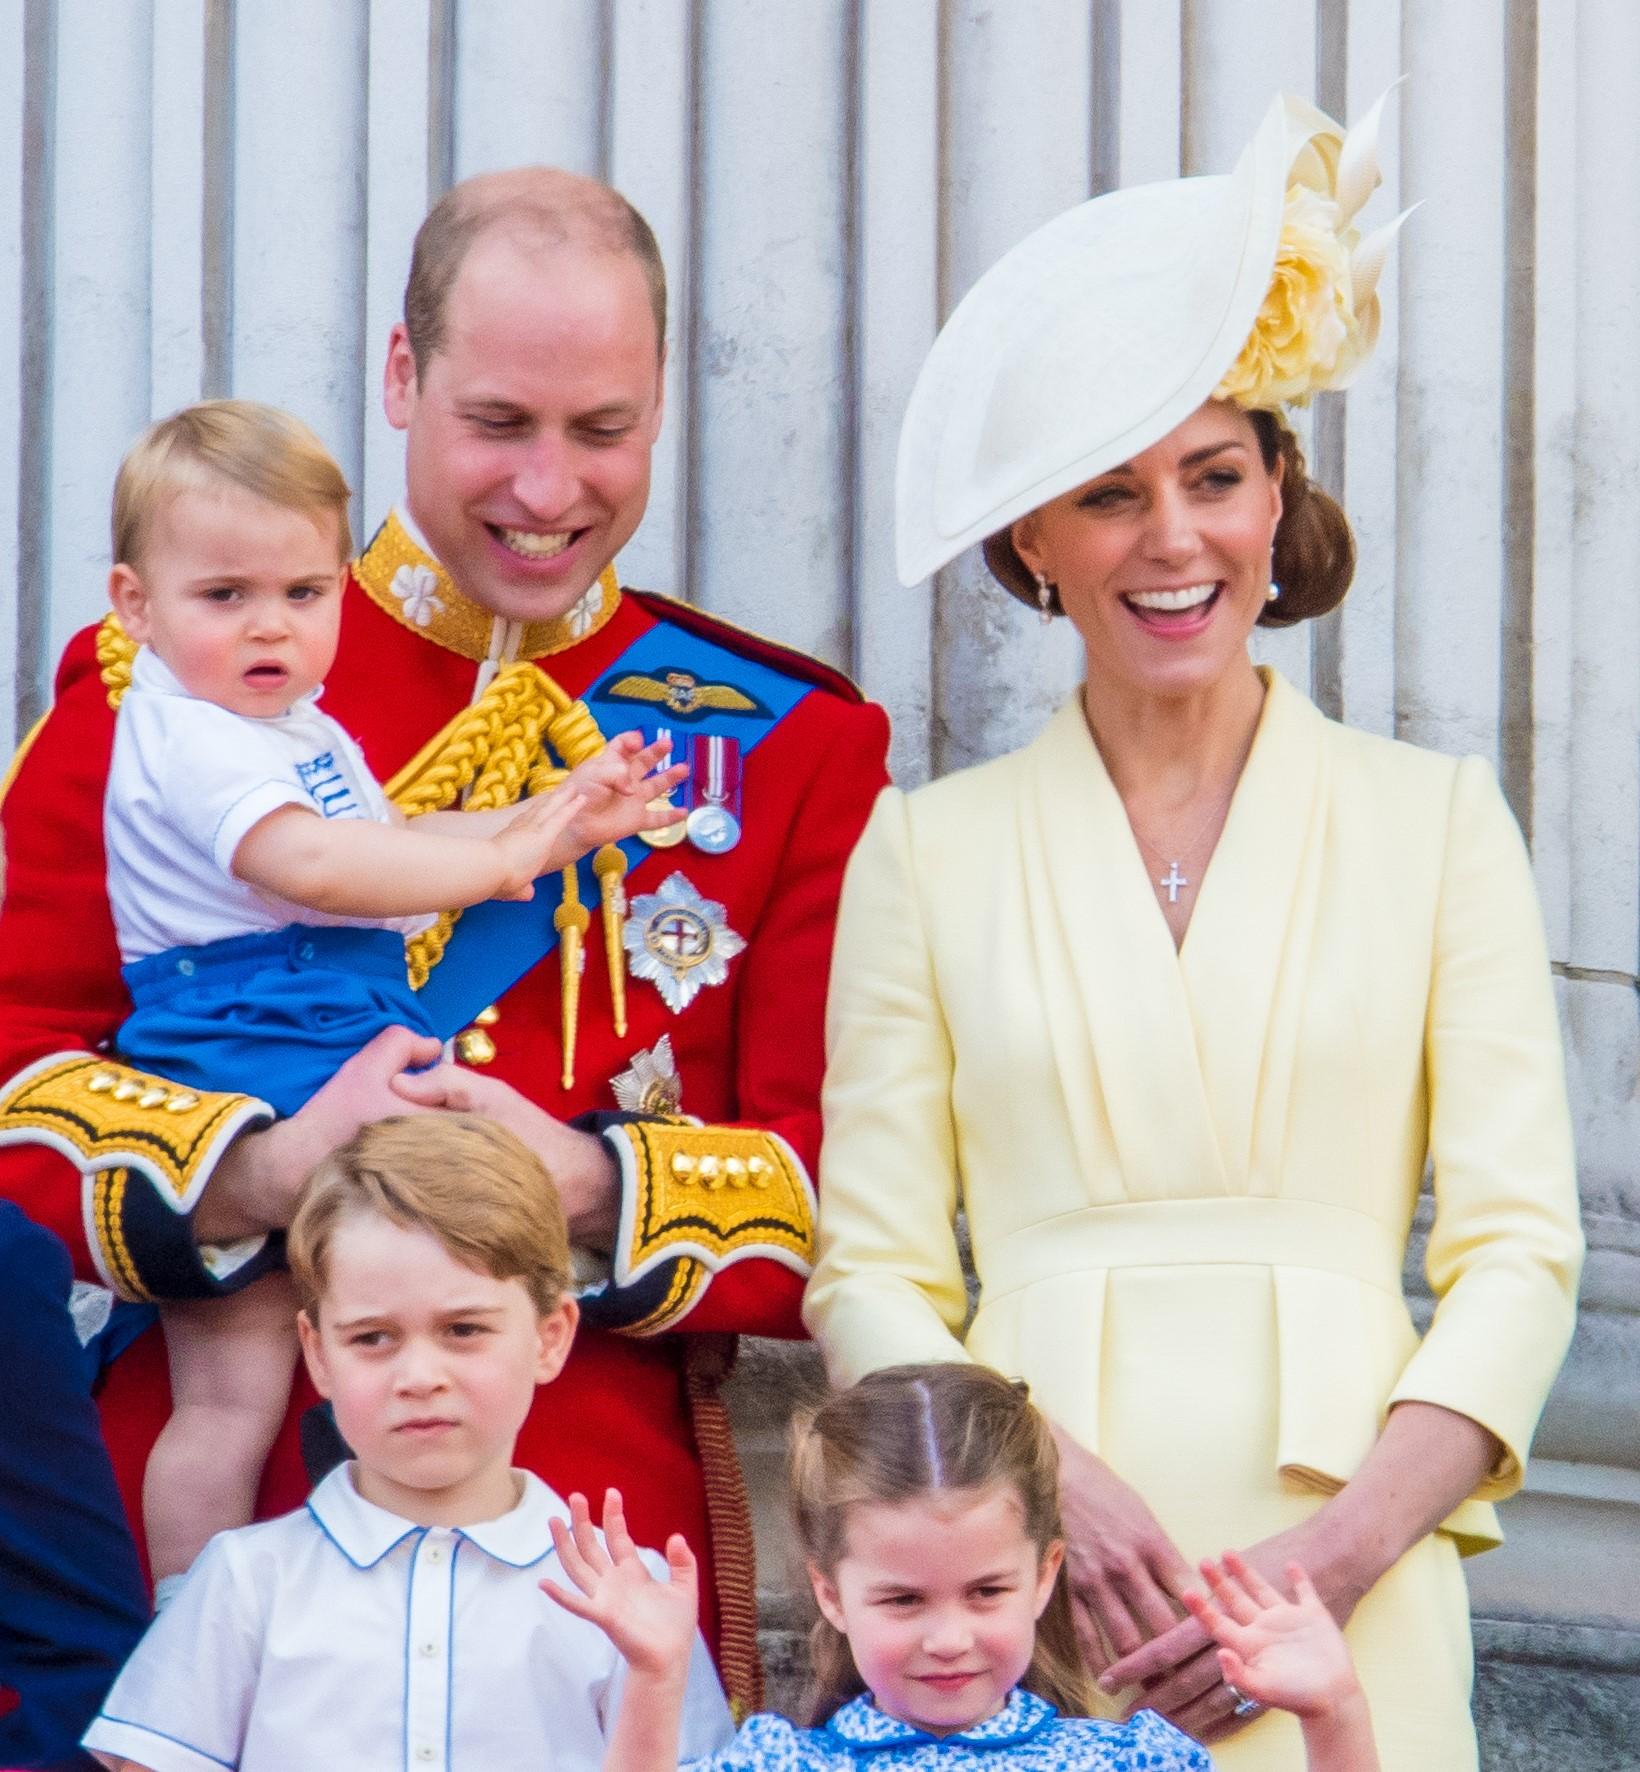 The royals are enjoying a summer break